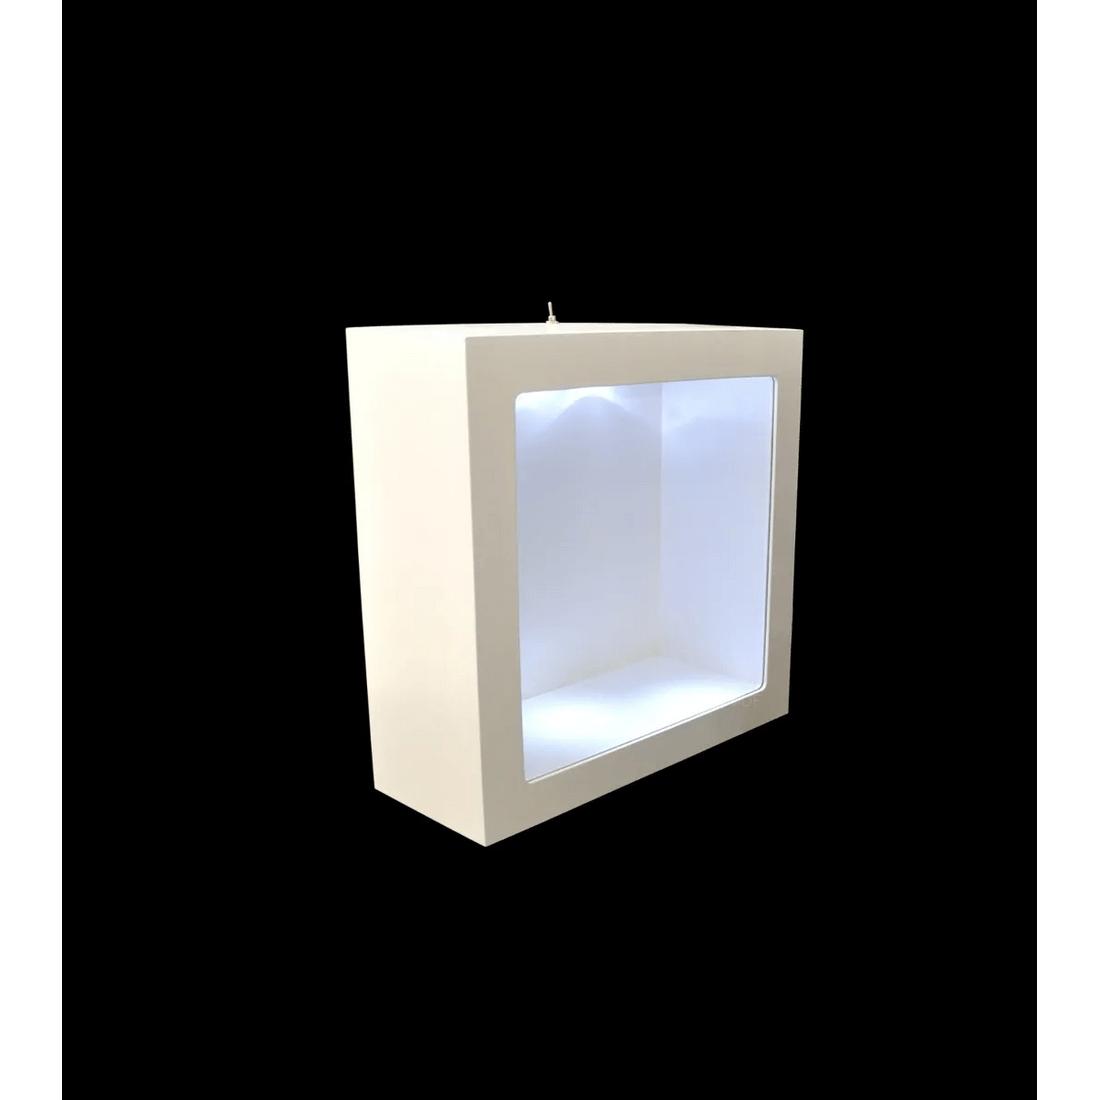 Nicho-Duplo-Quadrado-C-Led-e-Vidro-24x24x12-MDF-Pintado